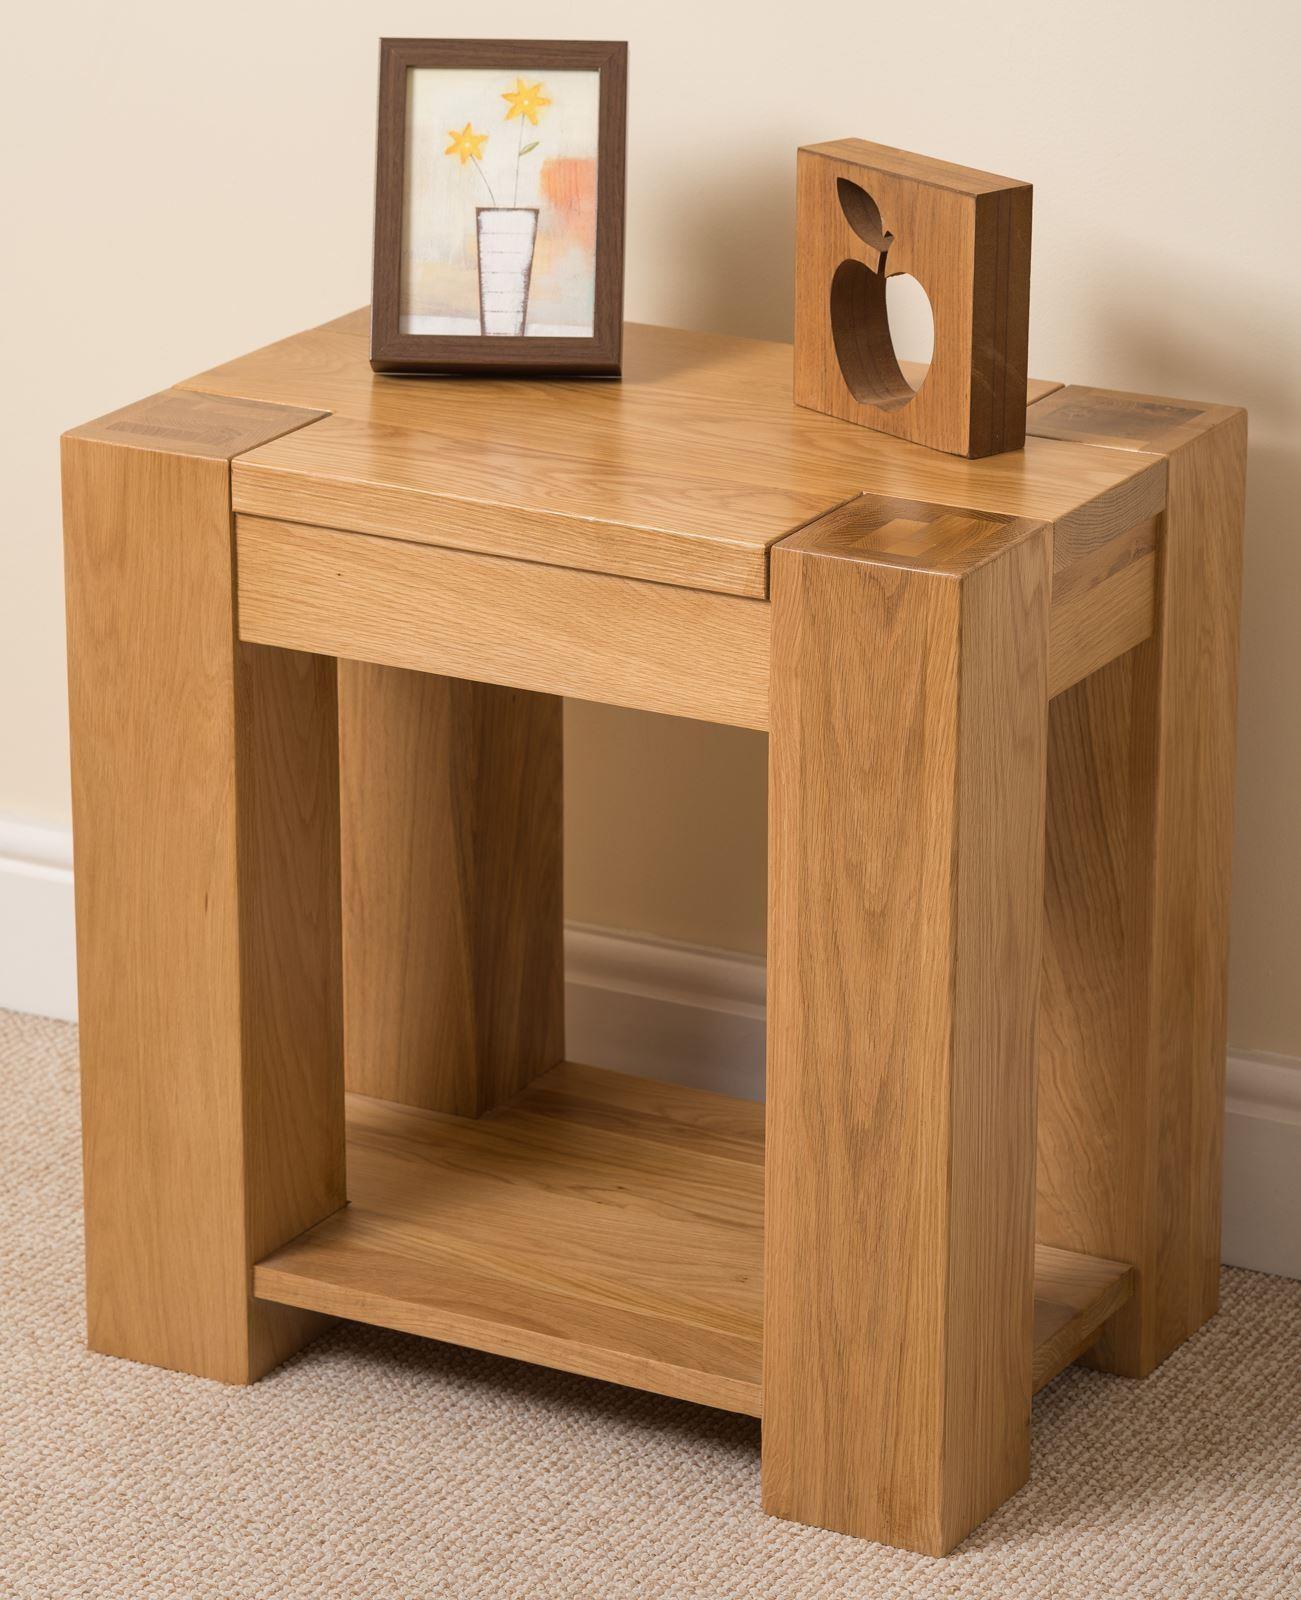 Kuba solid oak lamp table modern furniture direct for Modern furniture direct